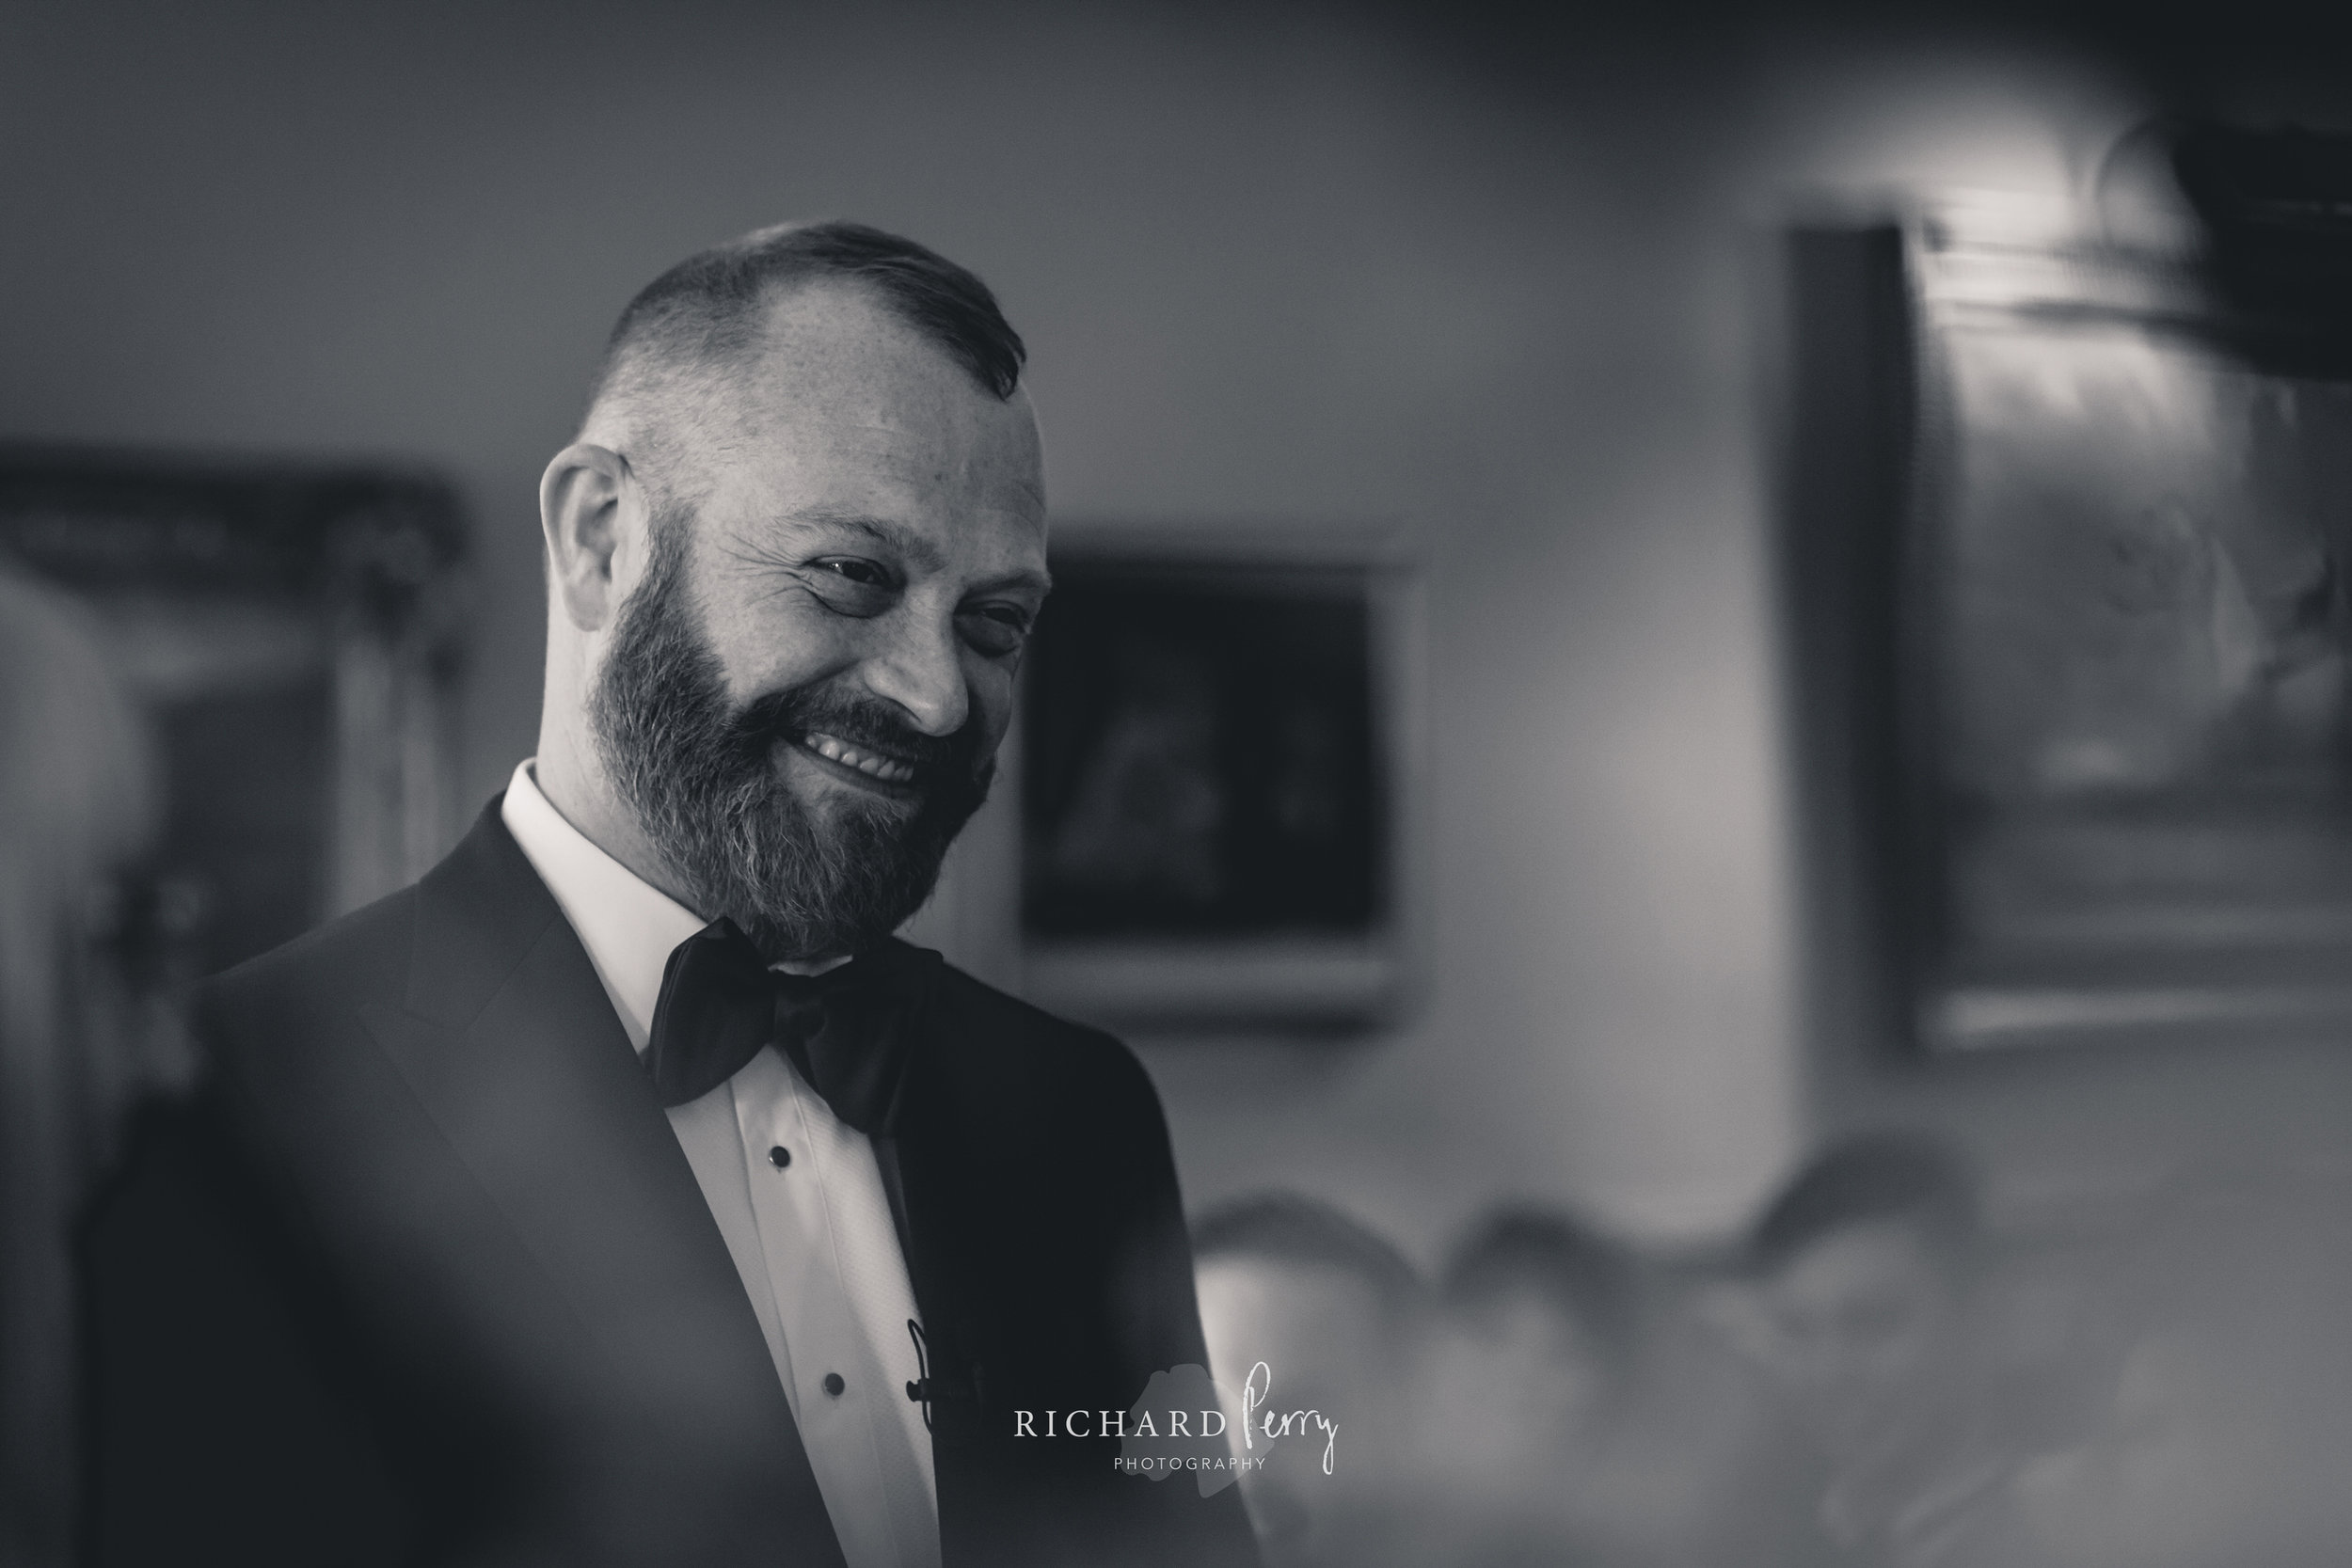 yorkshire-wedding-photographer-destination-archerfield-house-15.jpg